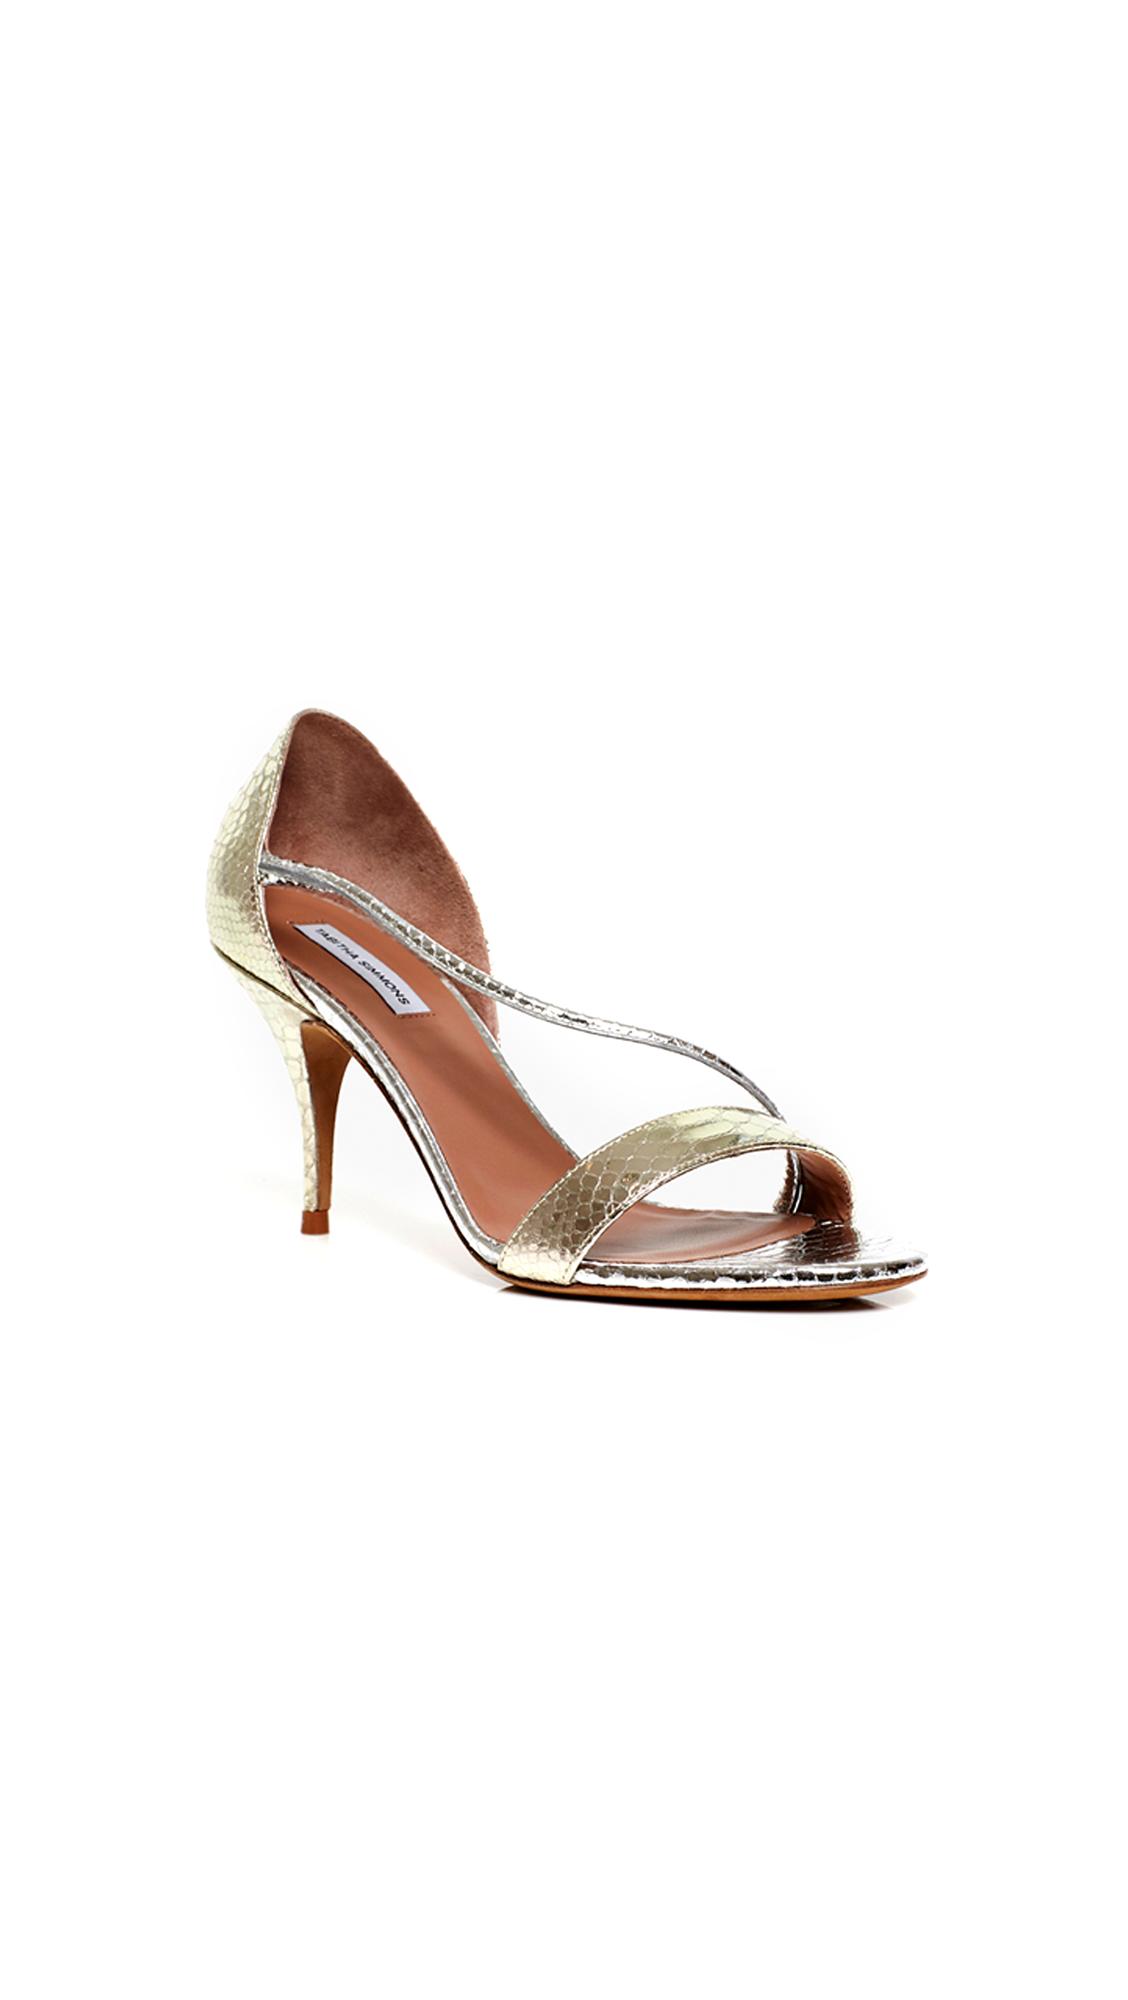 Buy Tabitha Simmons Nile Sandals online, shop Tabitha Simmons